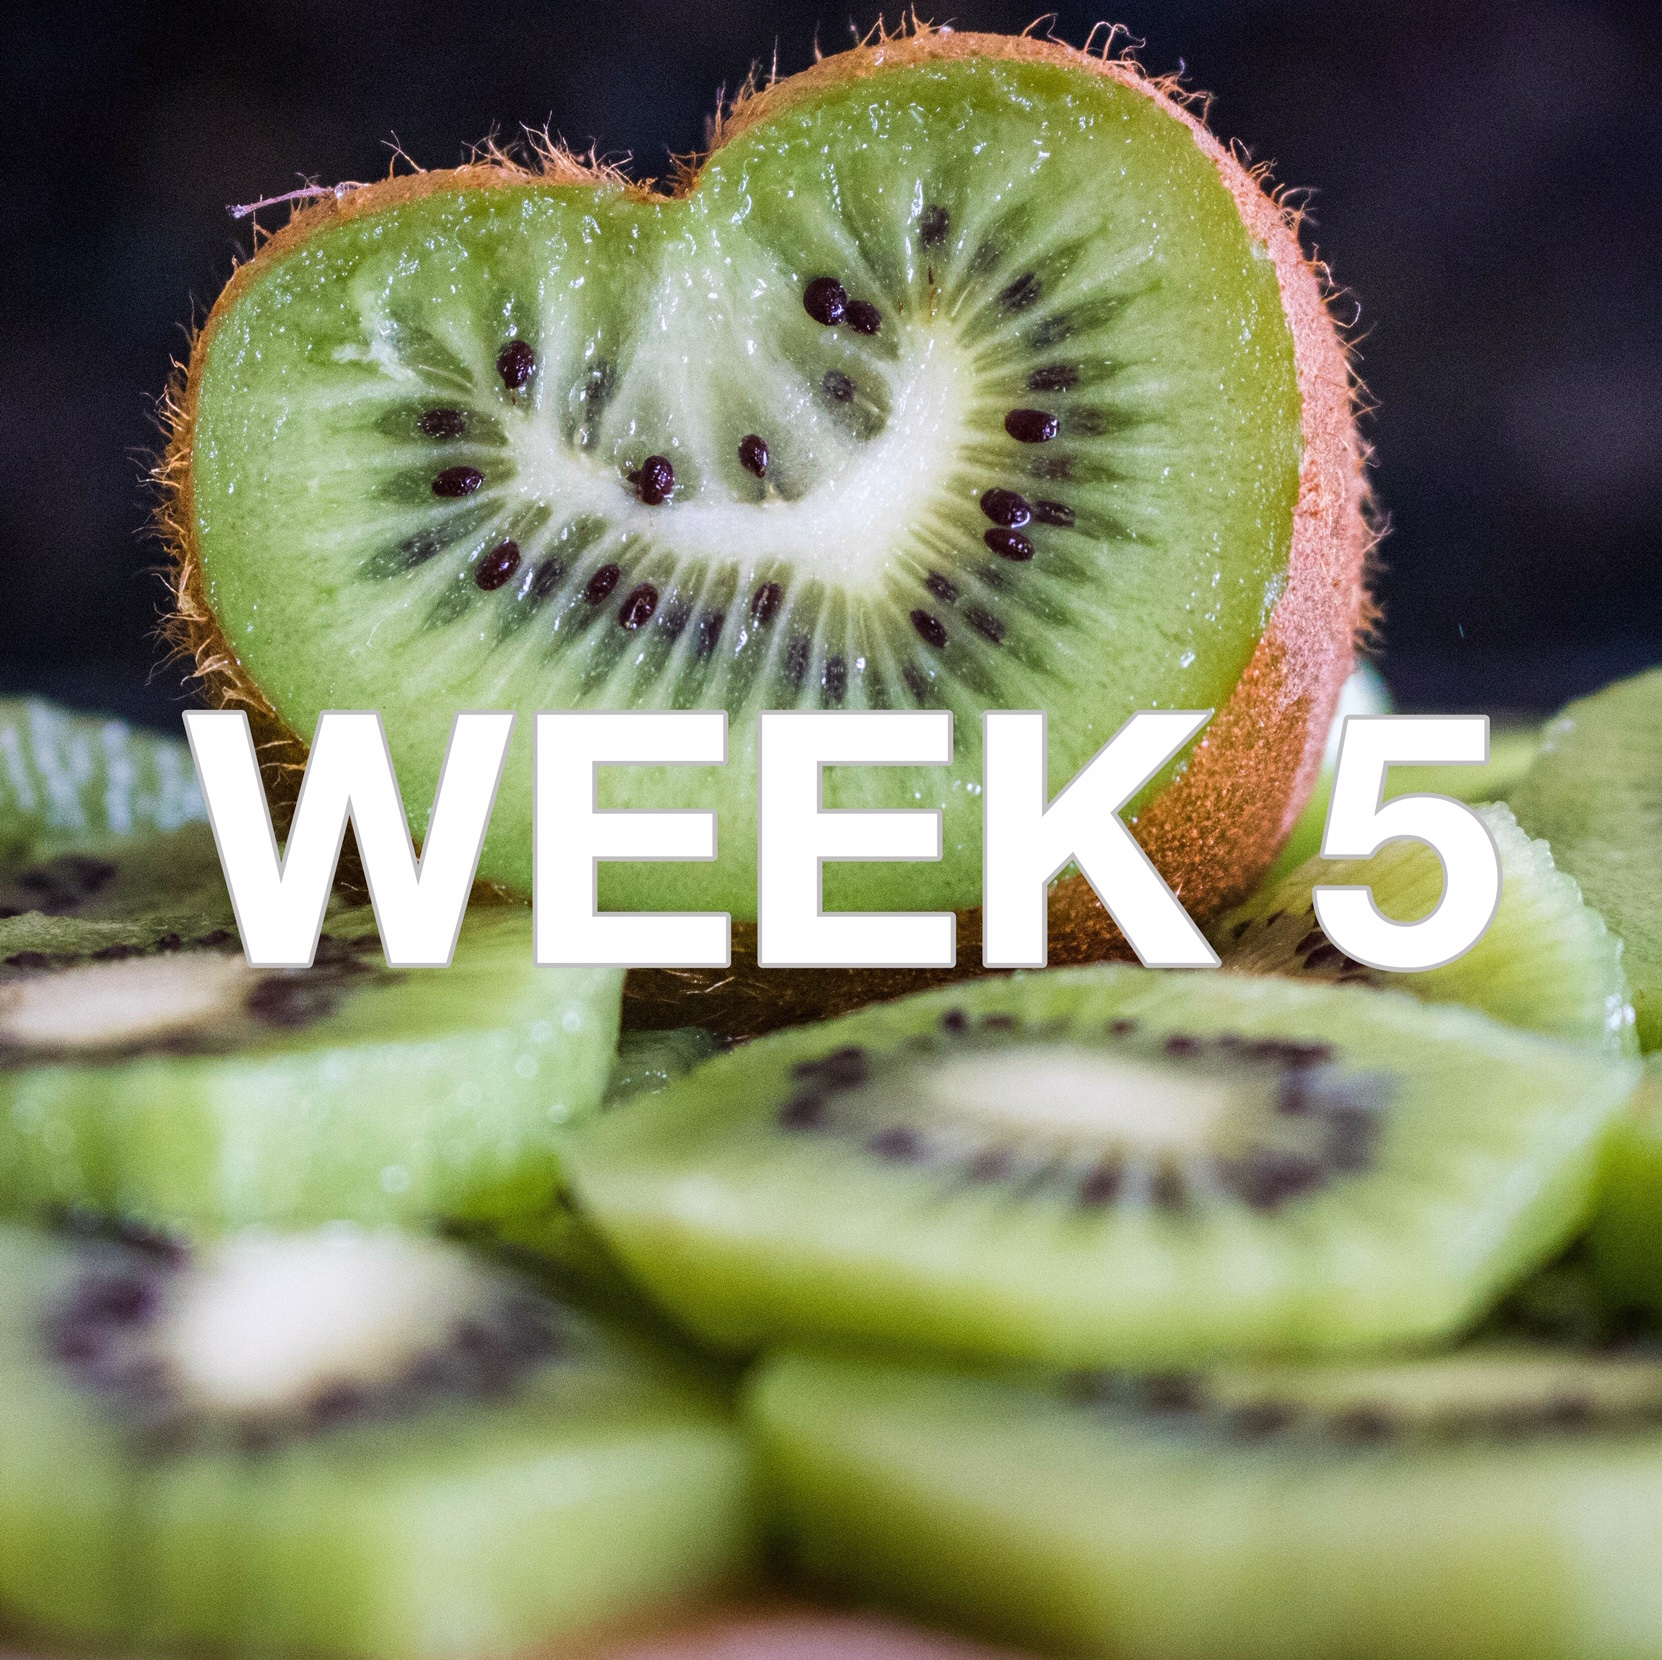 Beautiful Badass Method - Week 5 Menu - Photo by Lesley Juarez via Unsplash.com